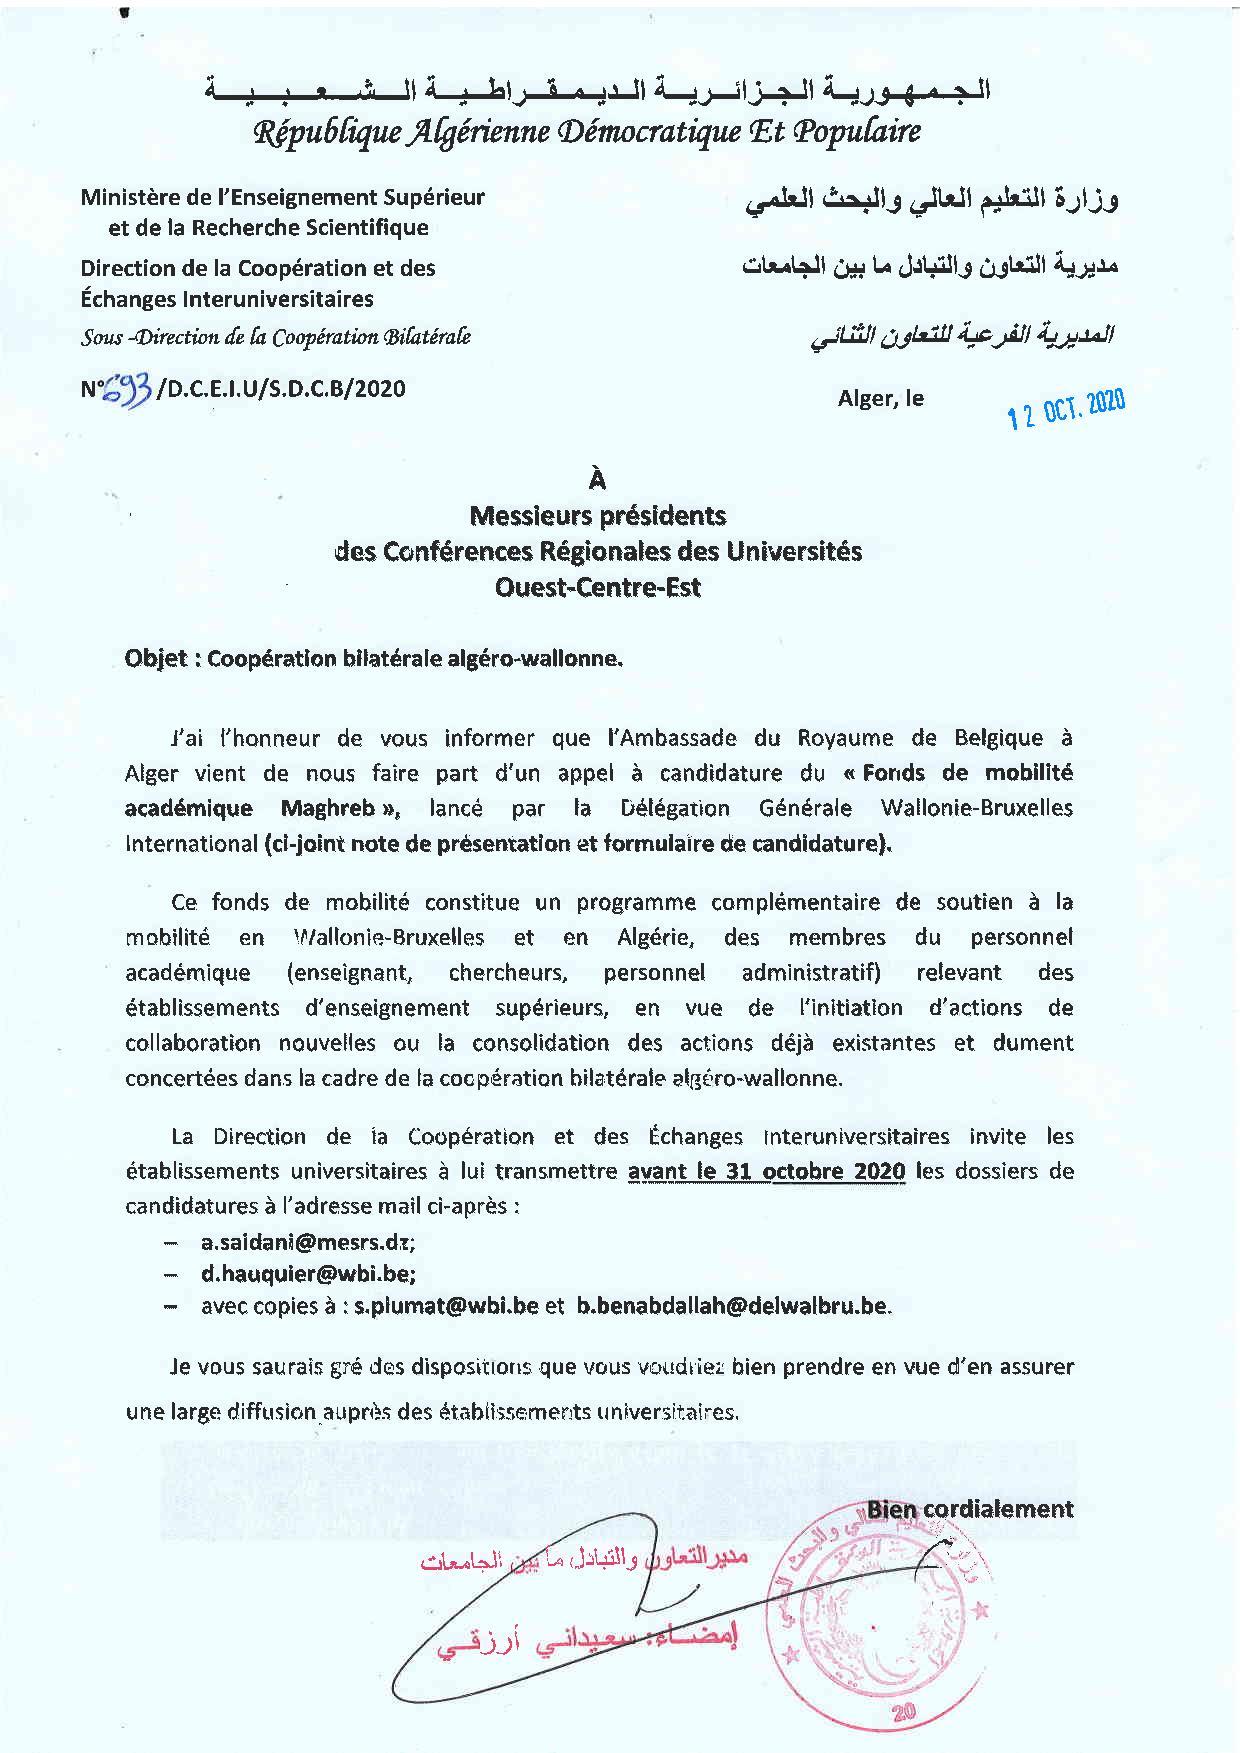 Algerian-Walloon Bilateral Cooperation